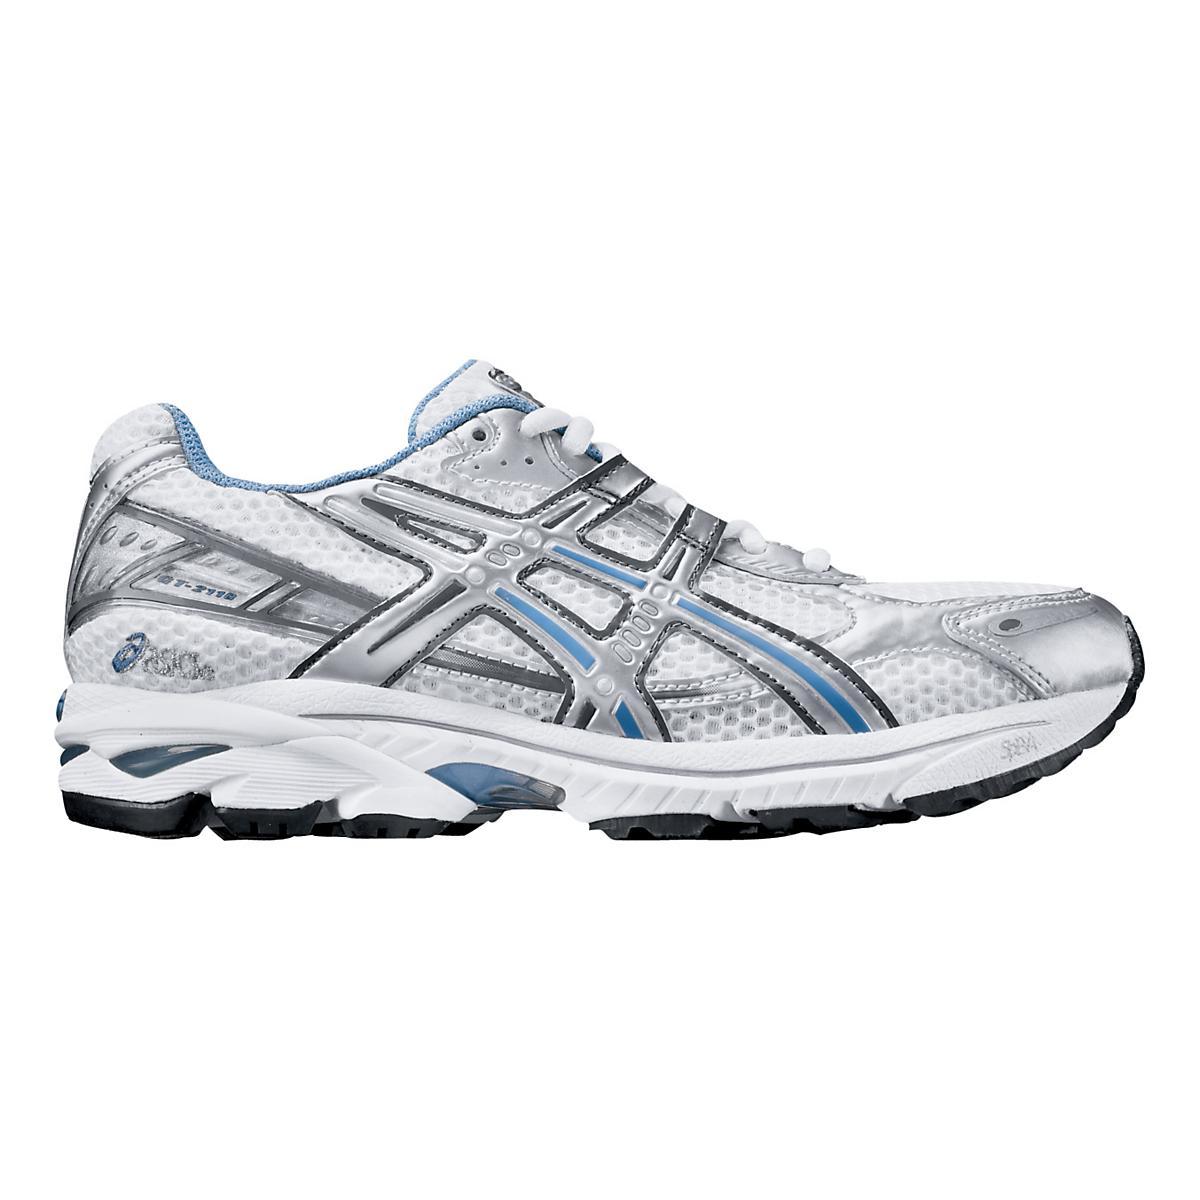 Womens ASICS GT-2110 Running Shoe at Road Runner Sports b0371d79b6